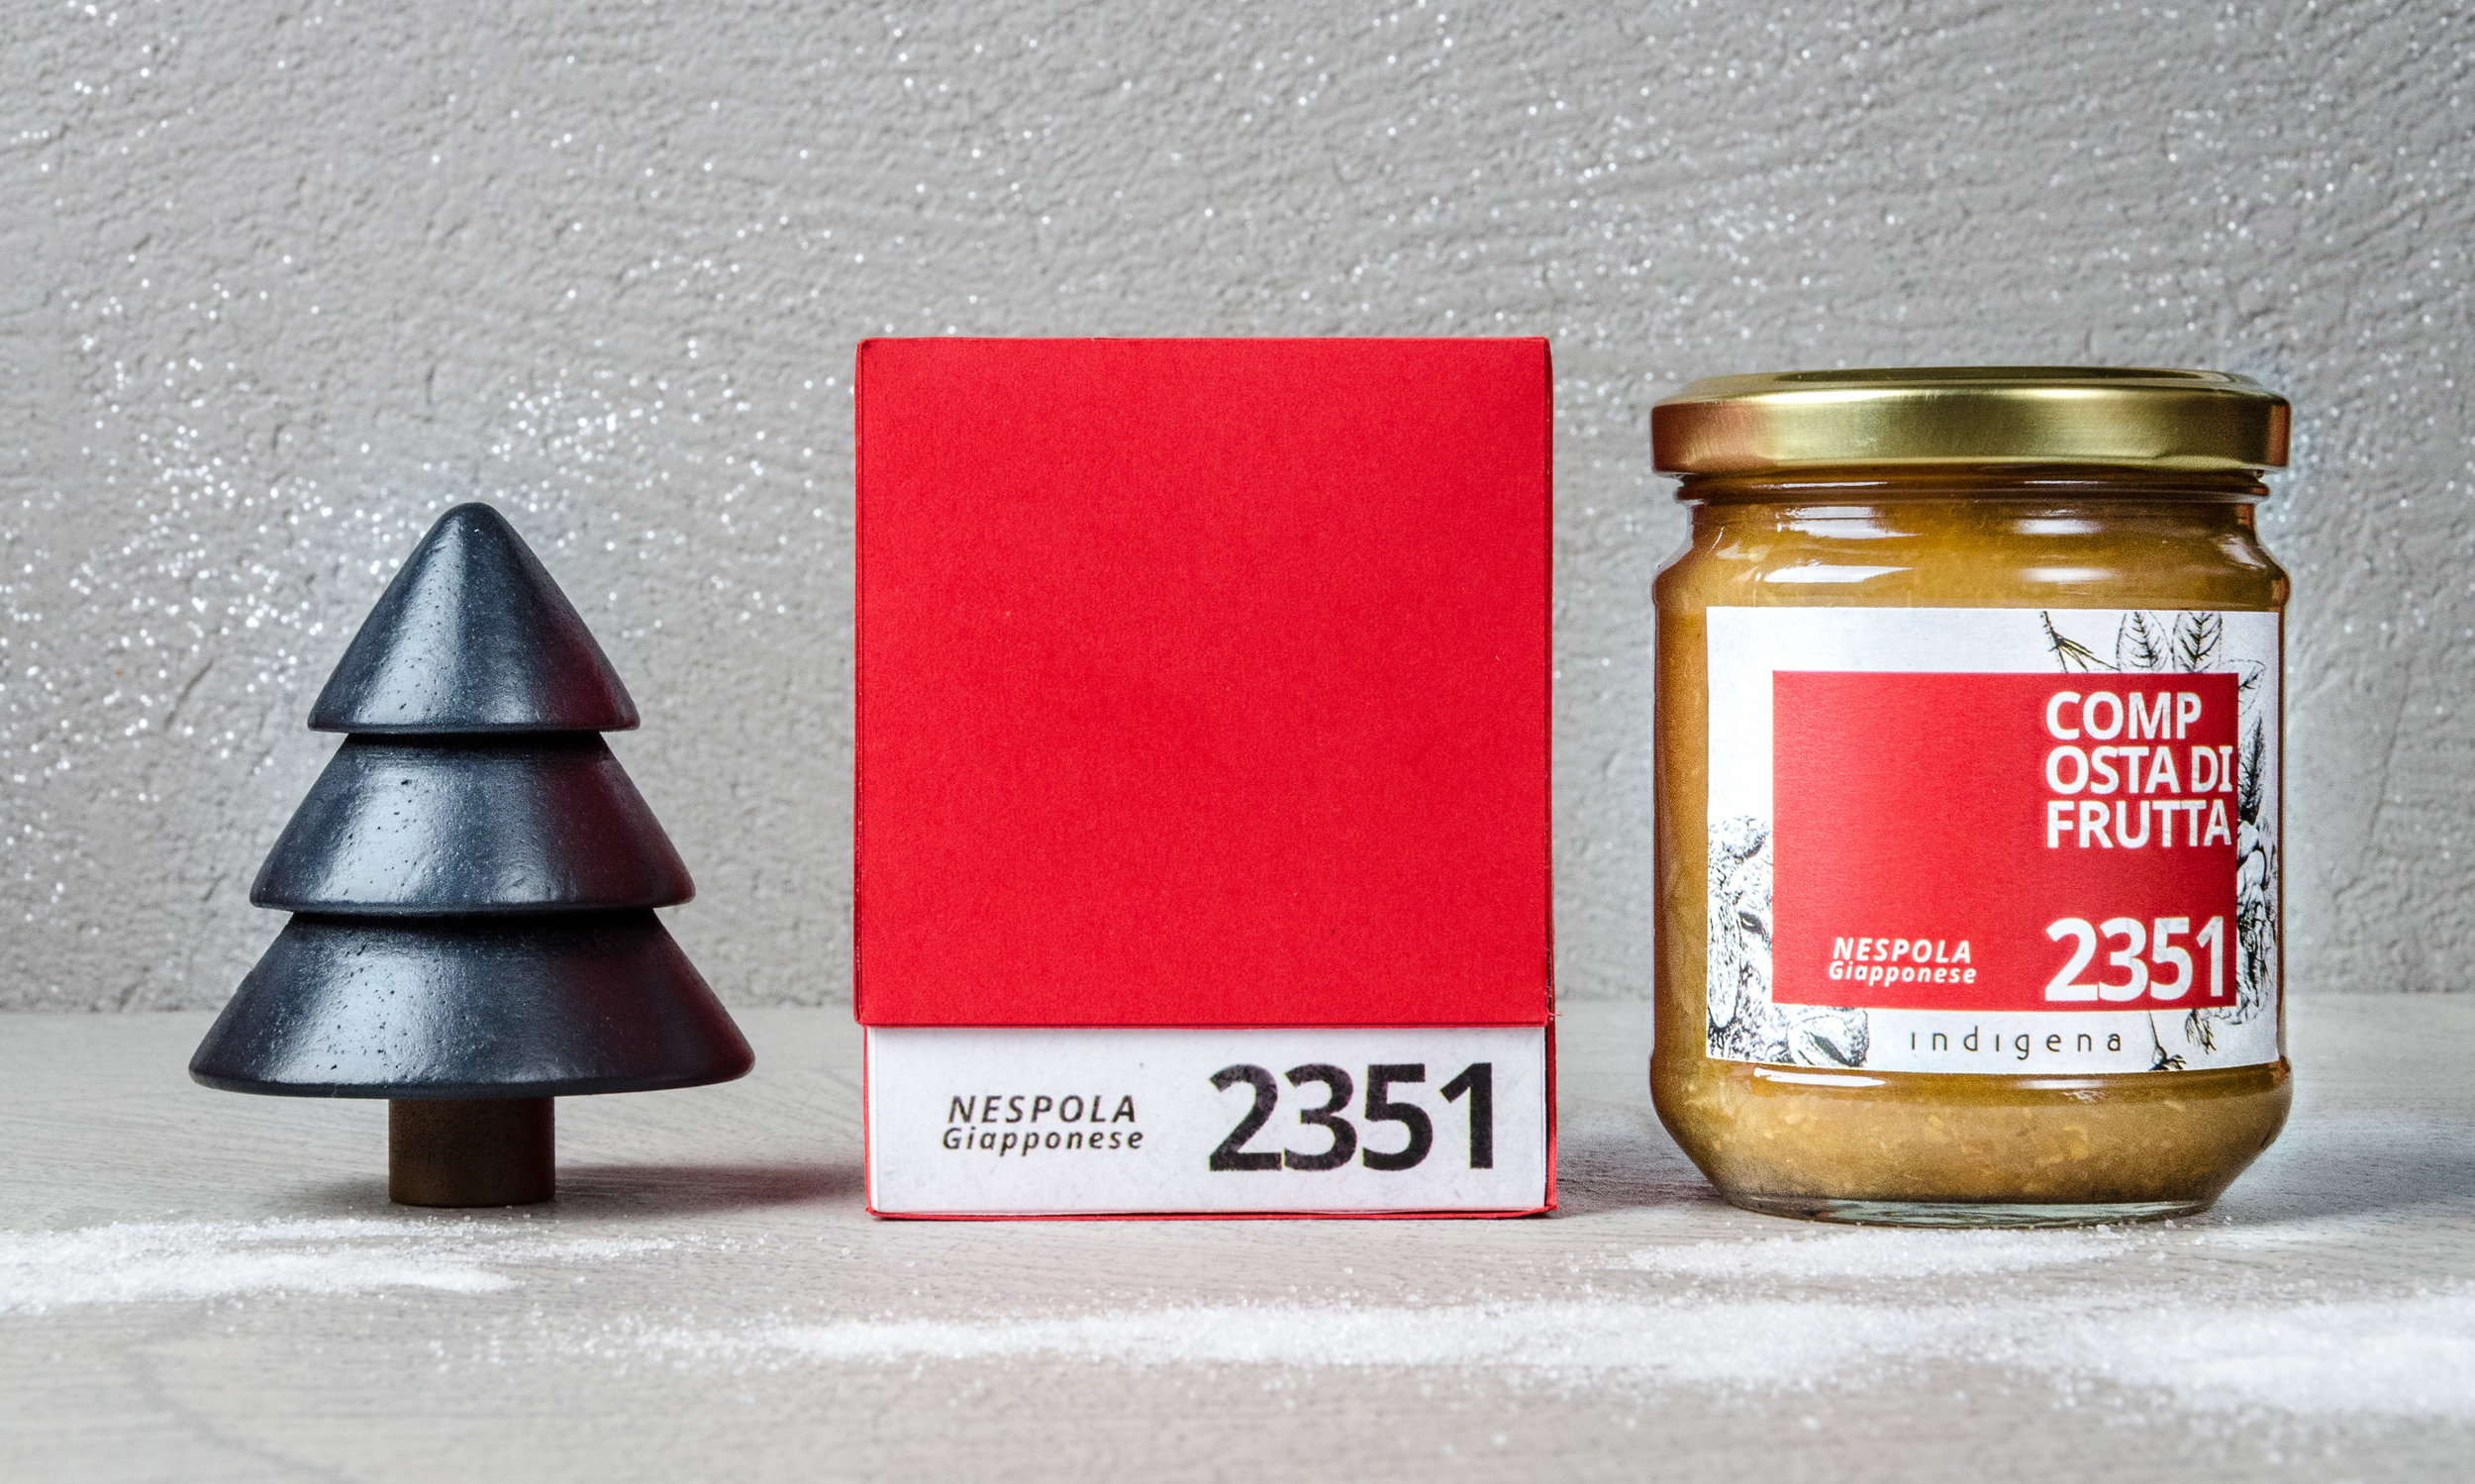 Indigena-packaging-christmas-biologico-bio-drawing-gold-red-3.jpg